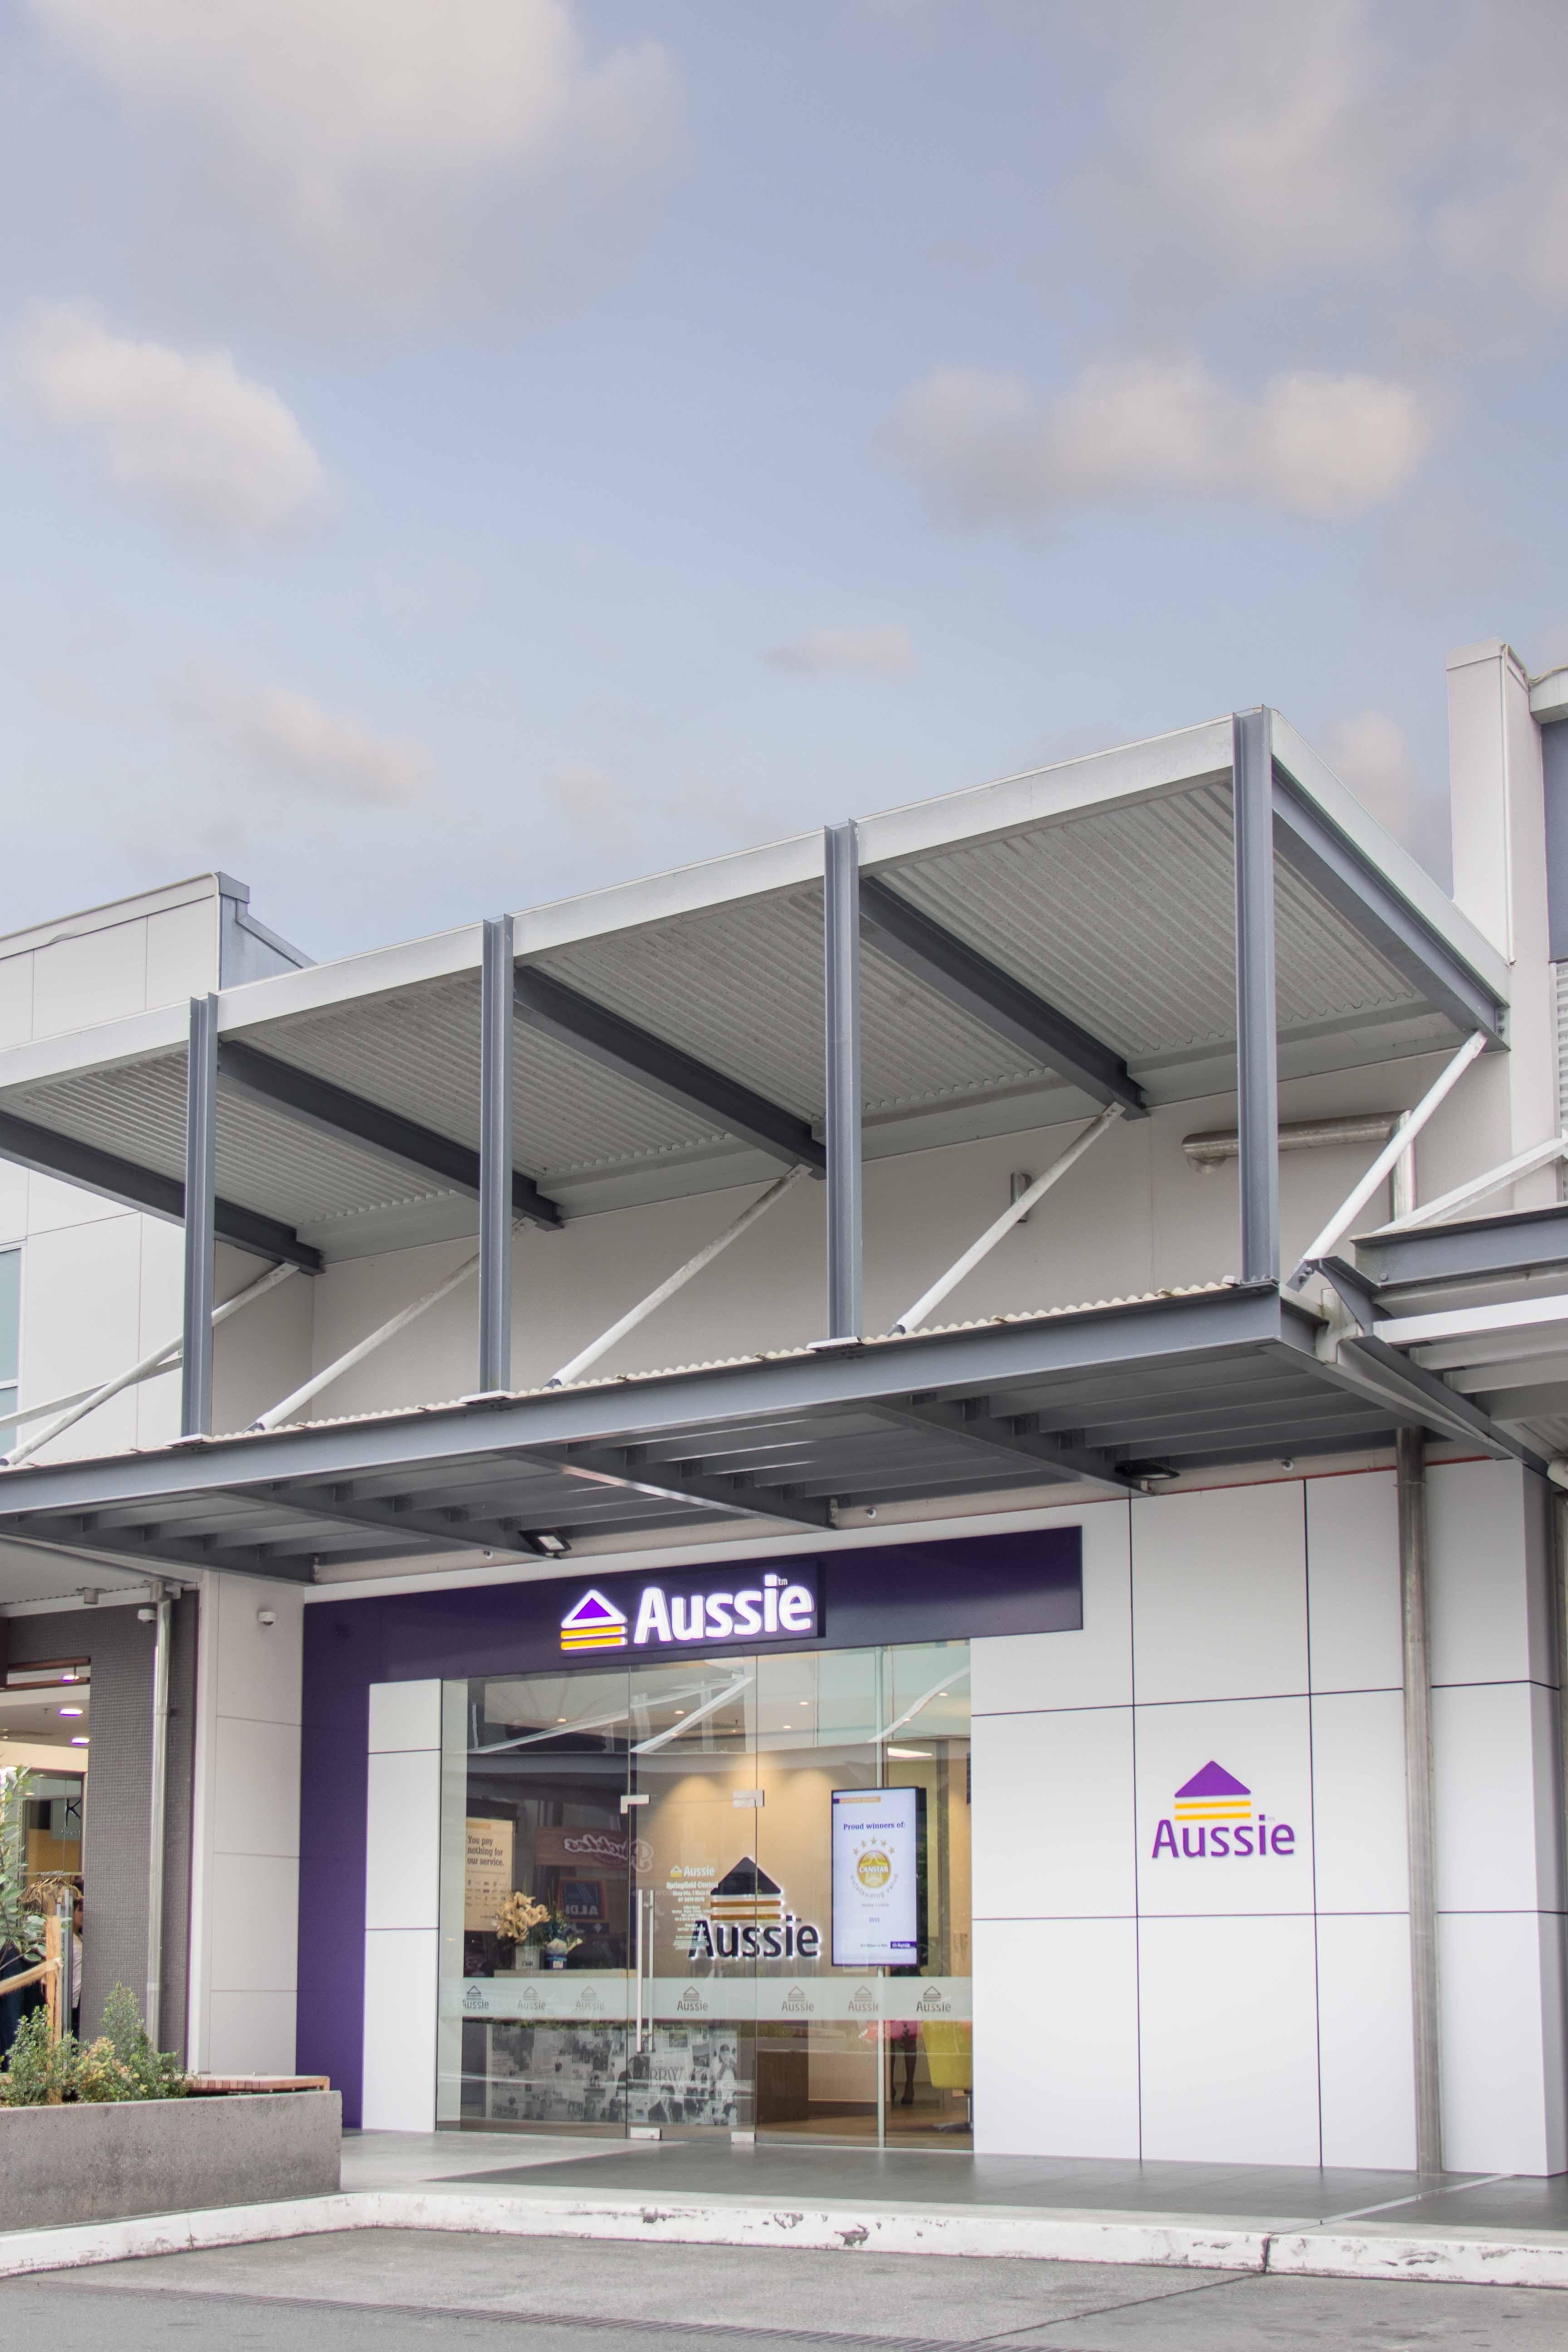 Franchise mortgage broker business for sale in Port Adelaide